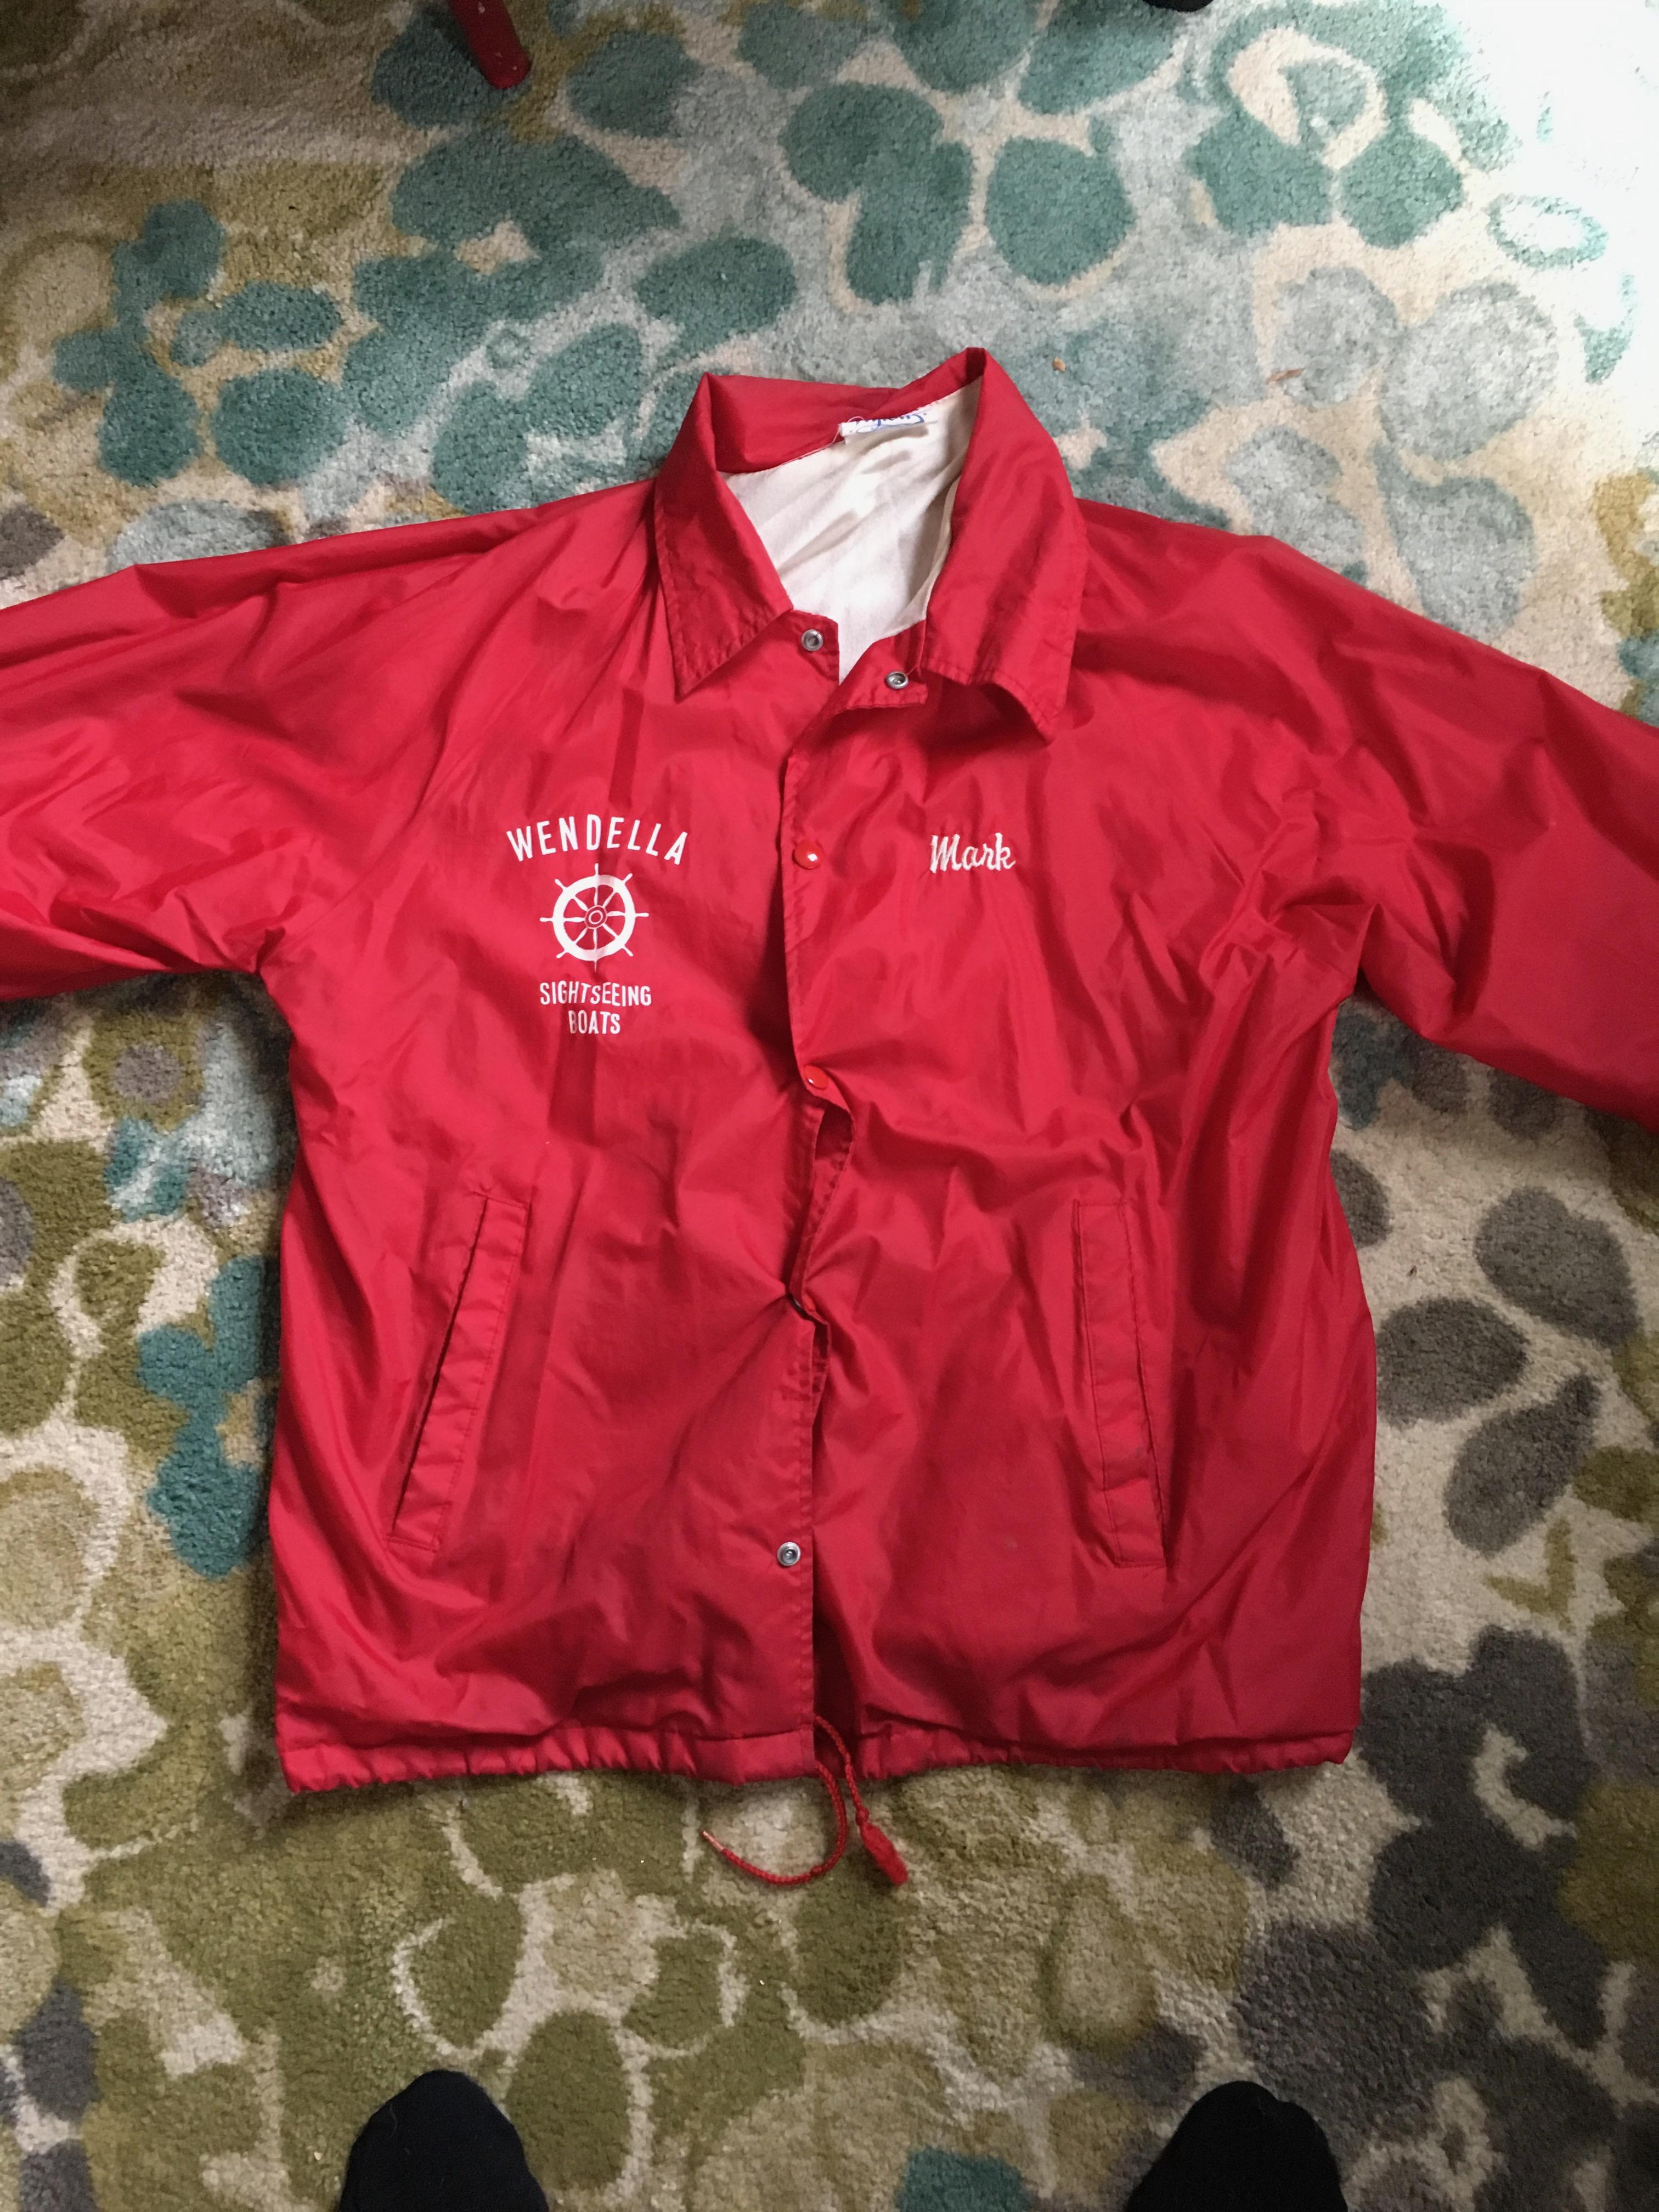 Jacket from summer job, circa 1988.